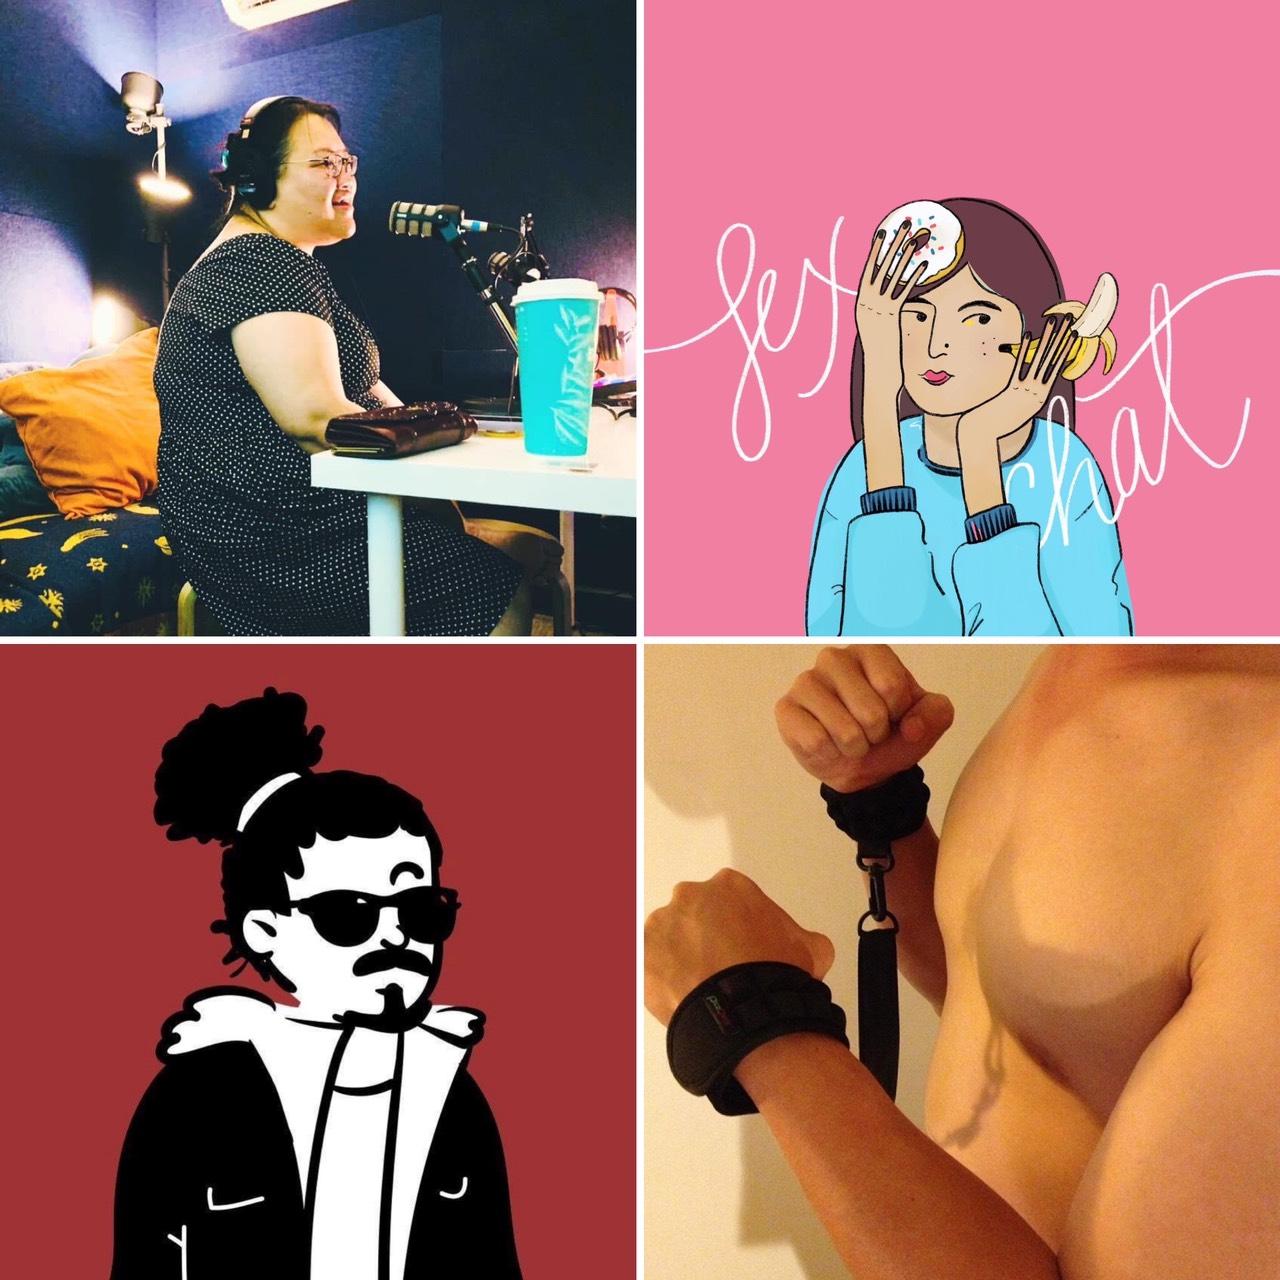 Ep. 52 給精蟲、卵子衝腦大學生的必修性愛通識課  20個性建議  Ft. 談性說愛 揚、最偏激的podcast 史丹利、女同志週記 Amy